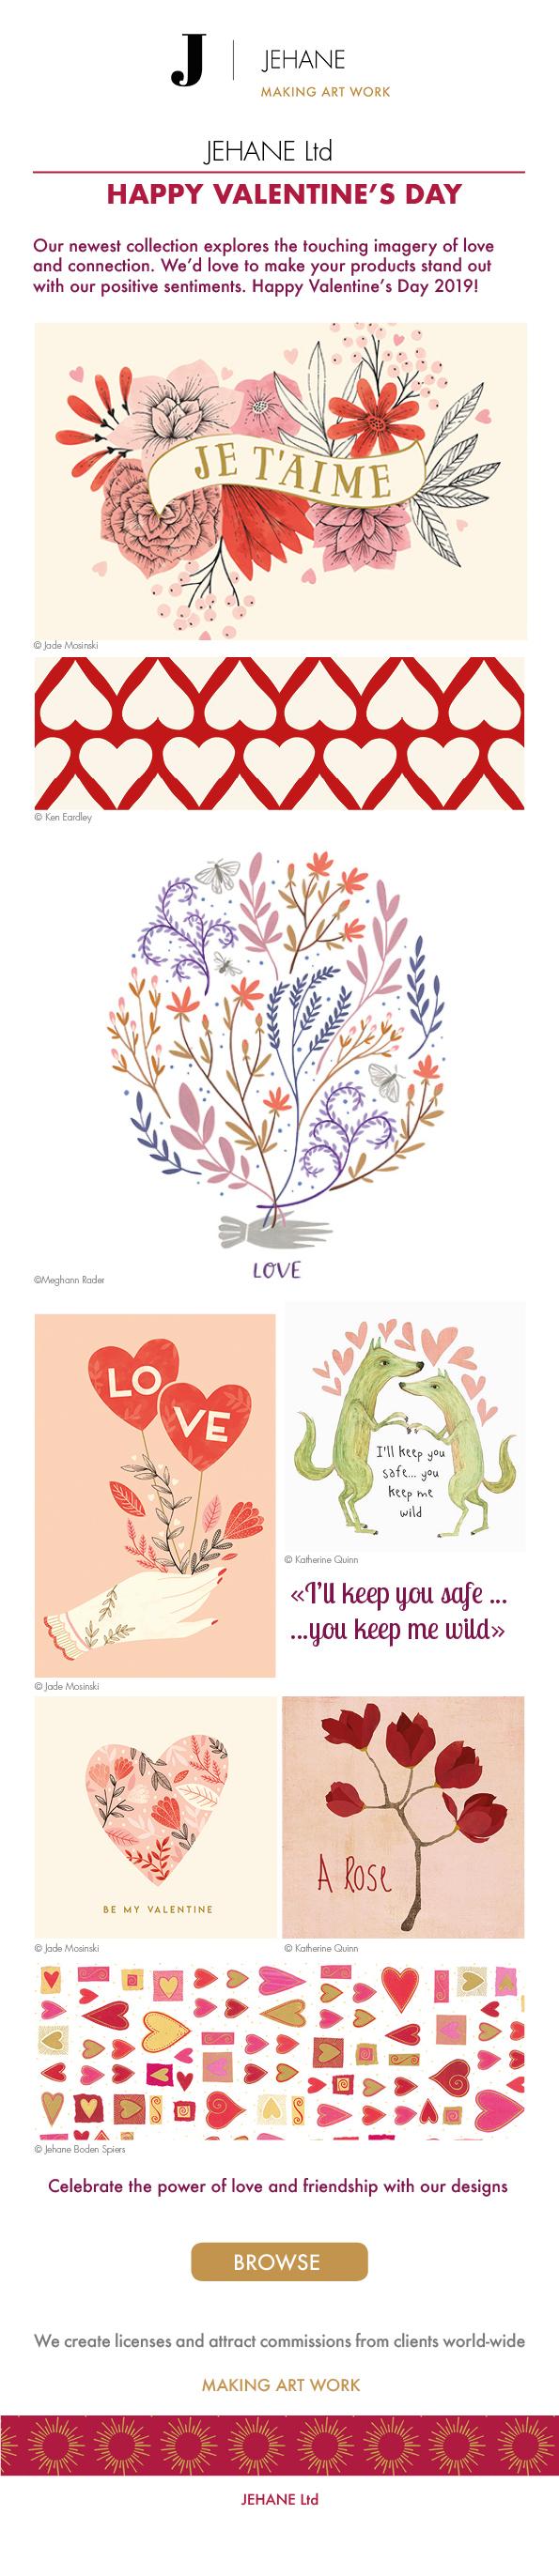 16_Valentine'sday.jpg